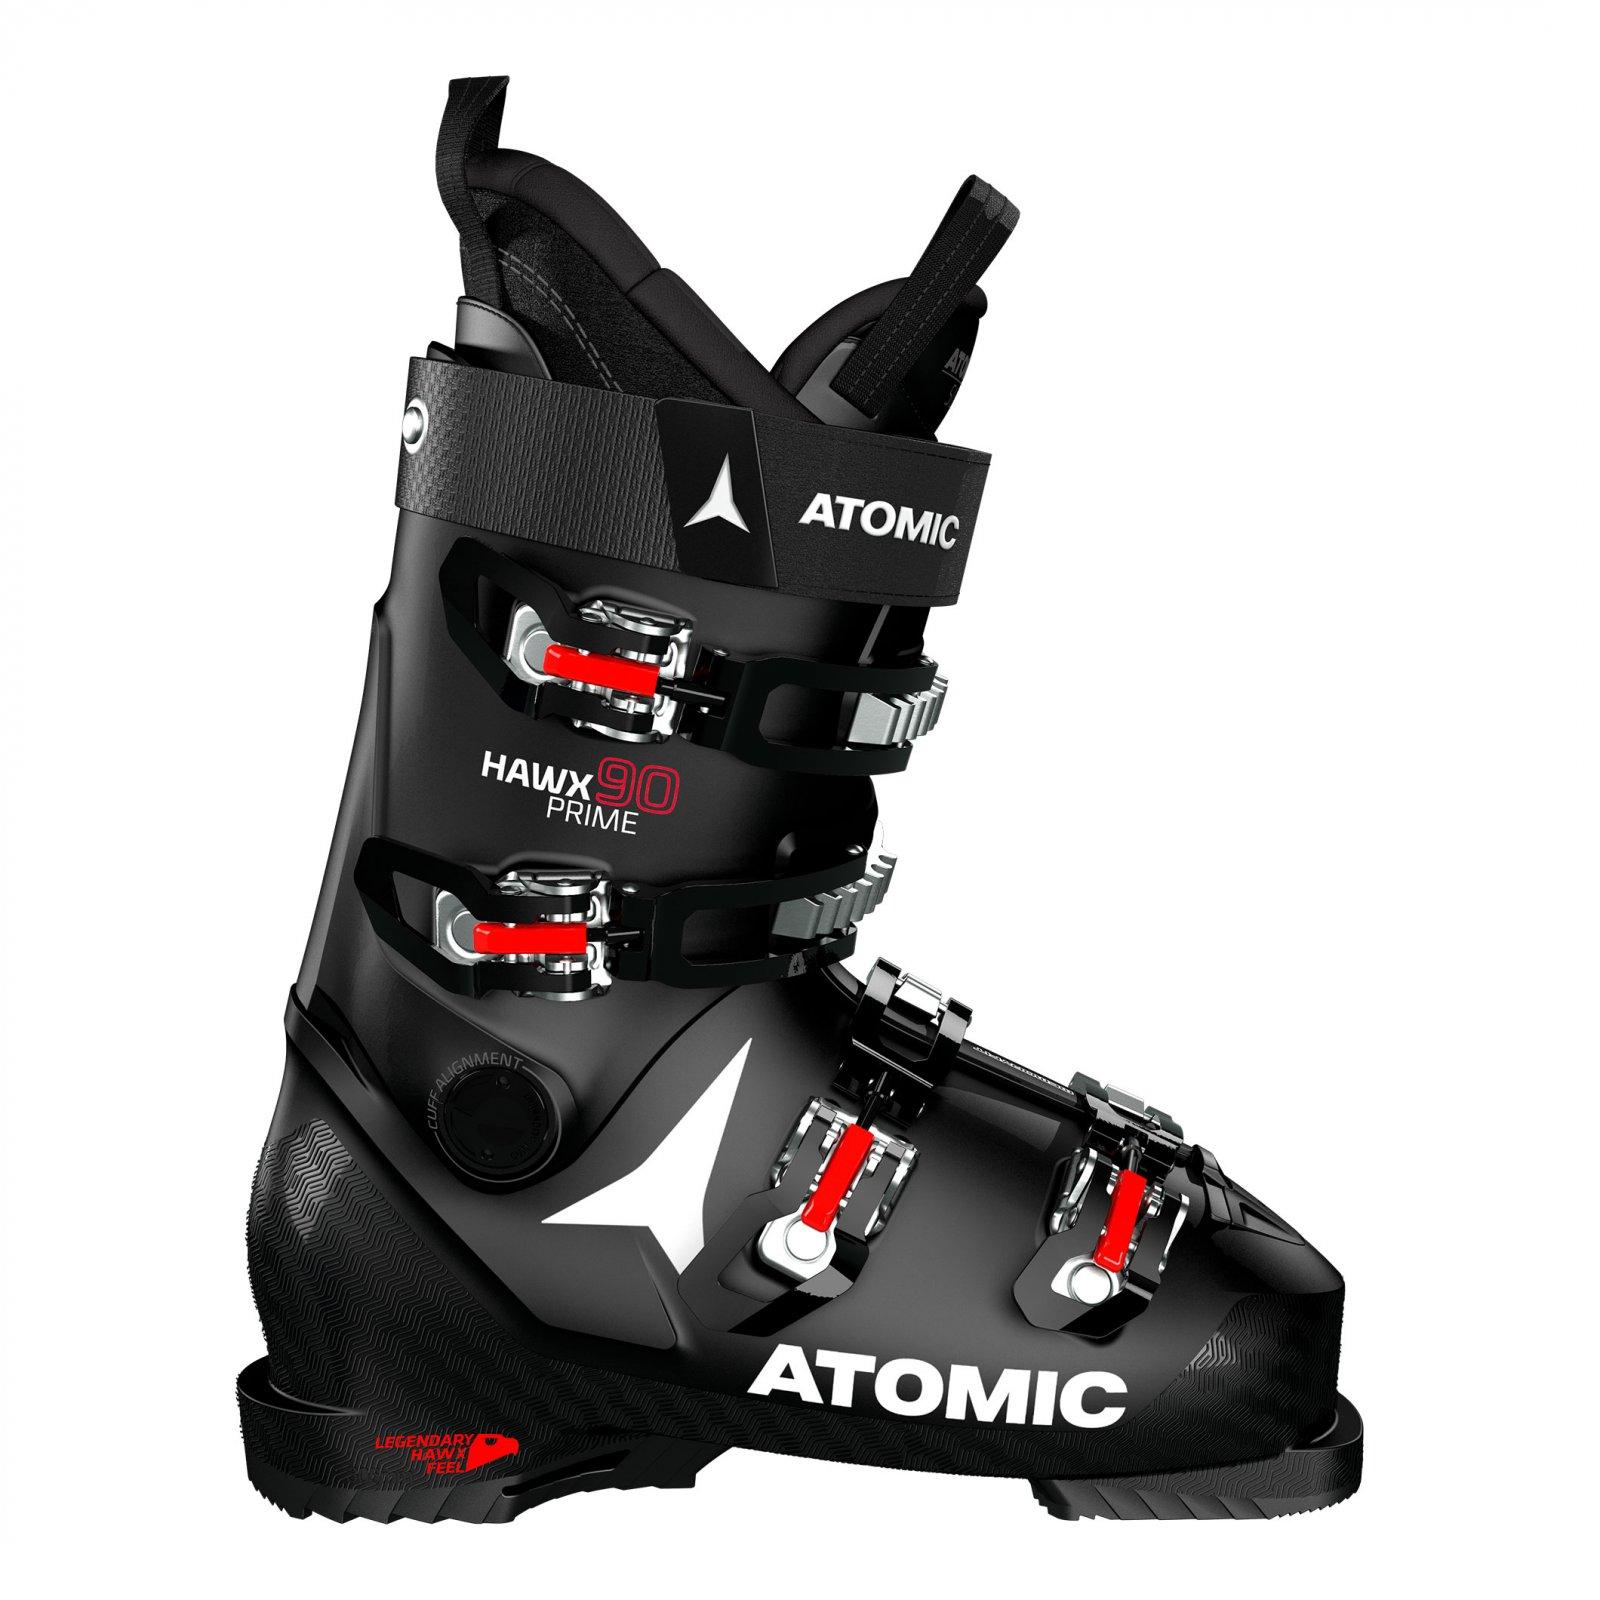 2021 Atomic Hawx Prime 90 Men's Ski Boots